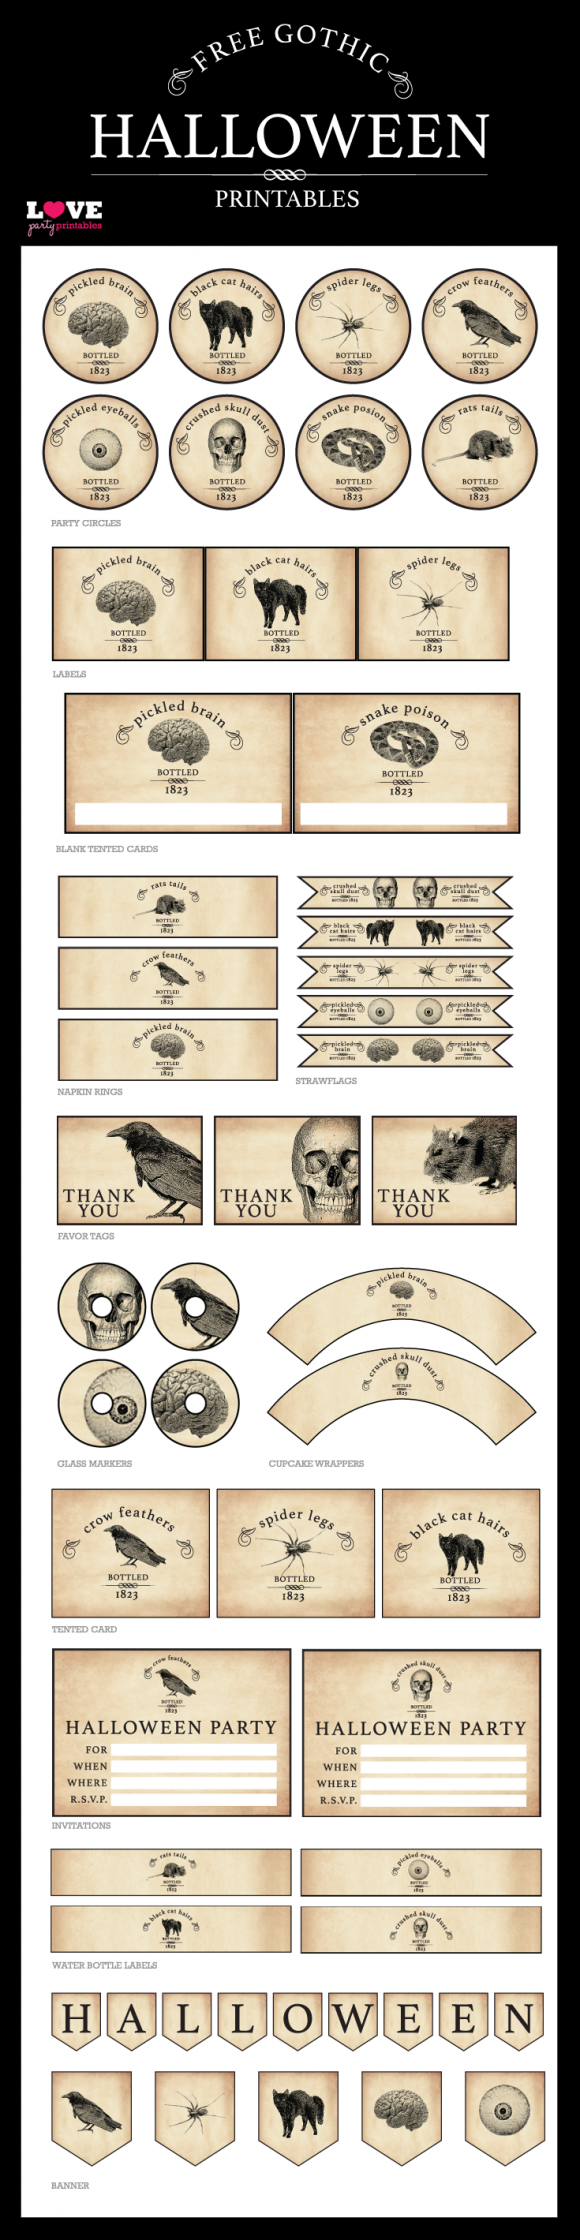 Gothic Halloween Free Printable